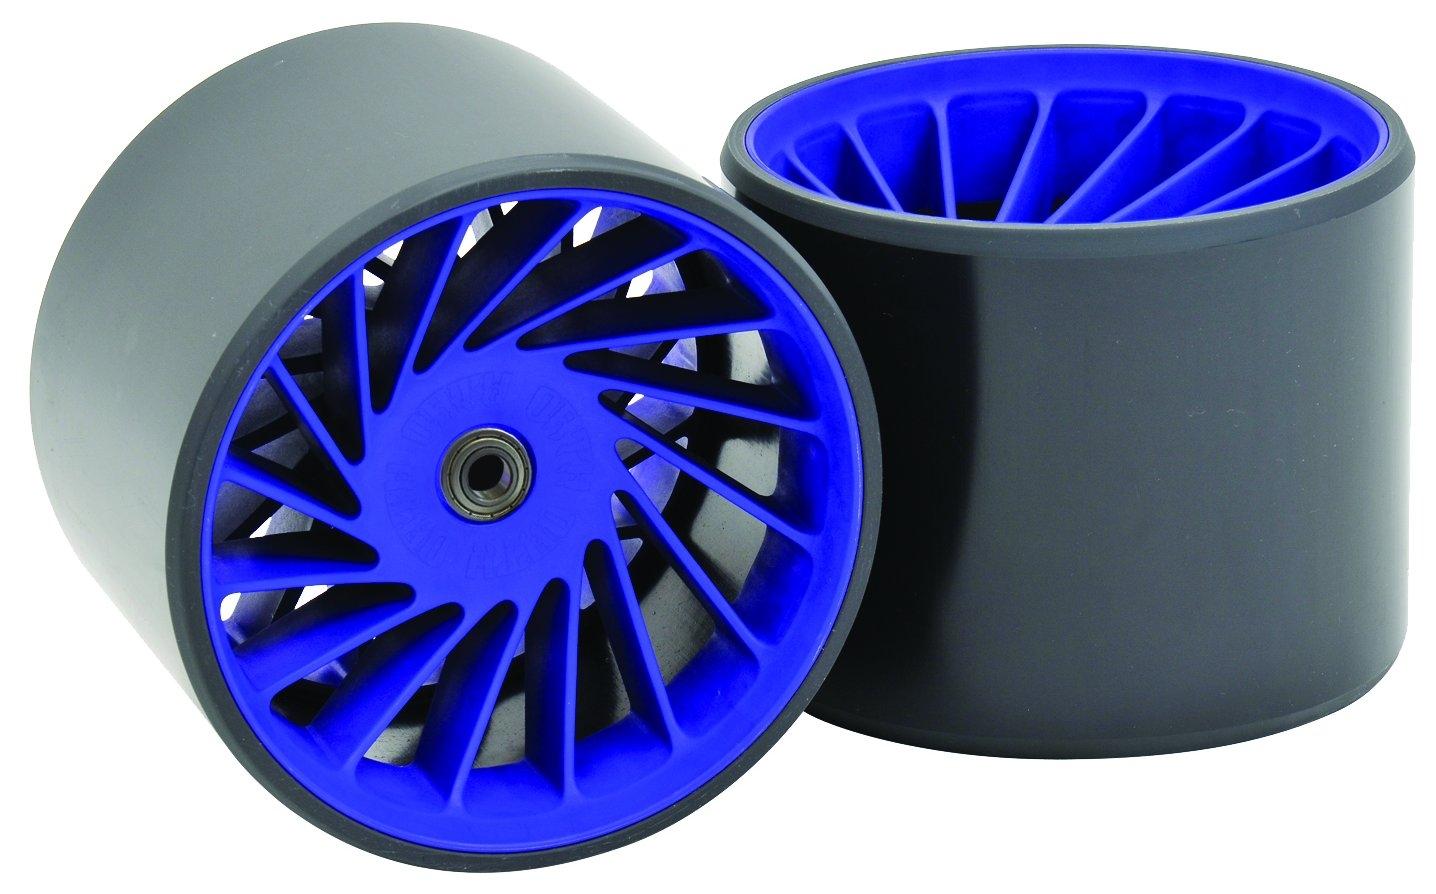 Triad Vanguard PVC Slick Drift Trike Rear Wheelset